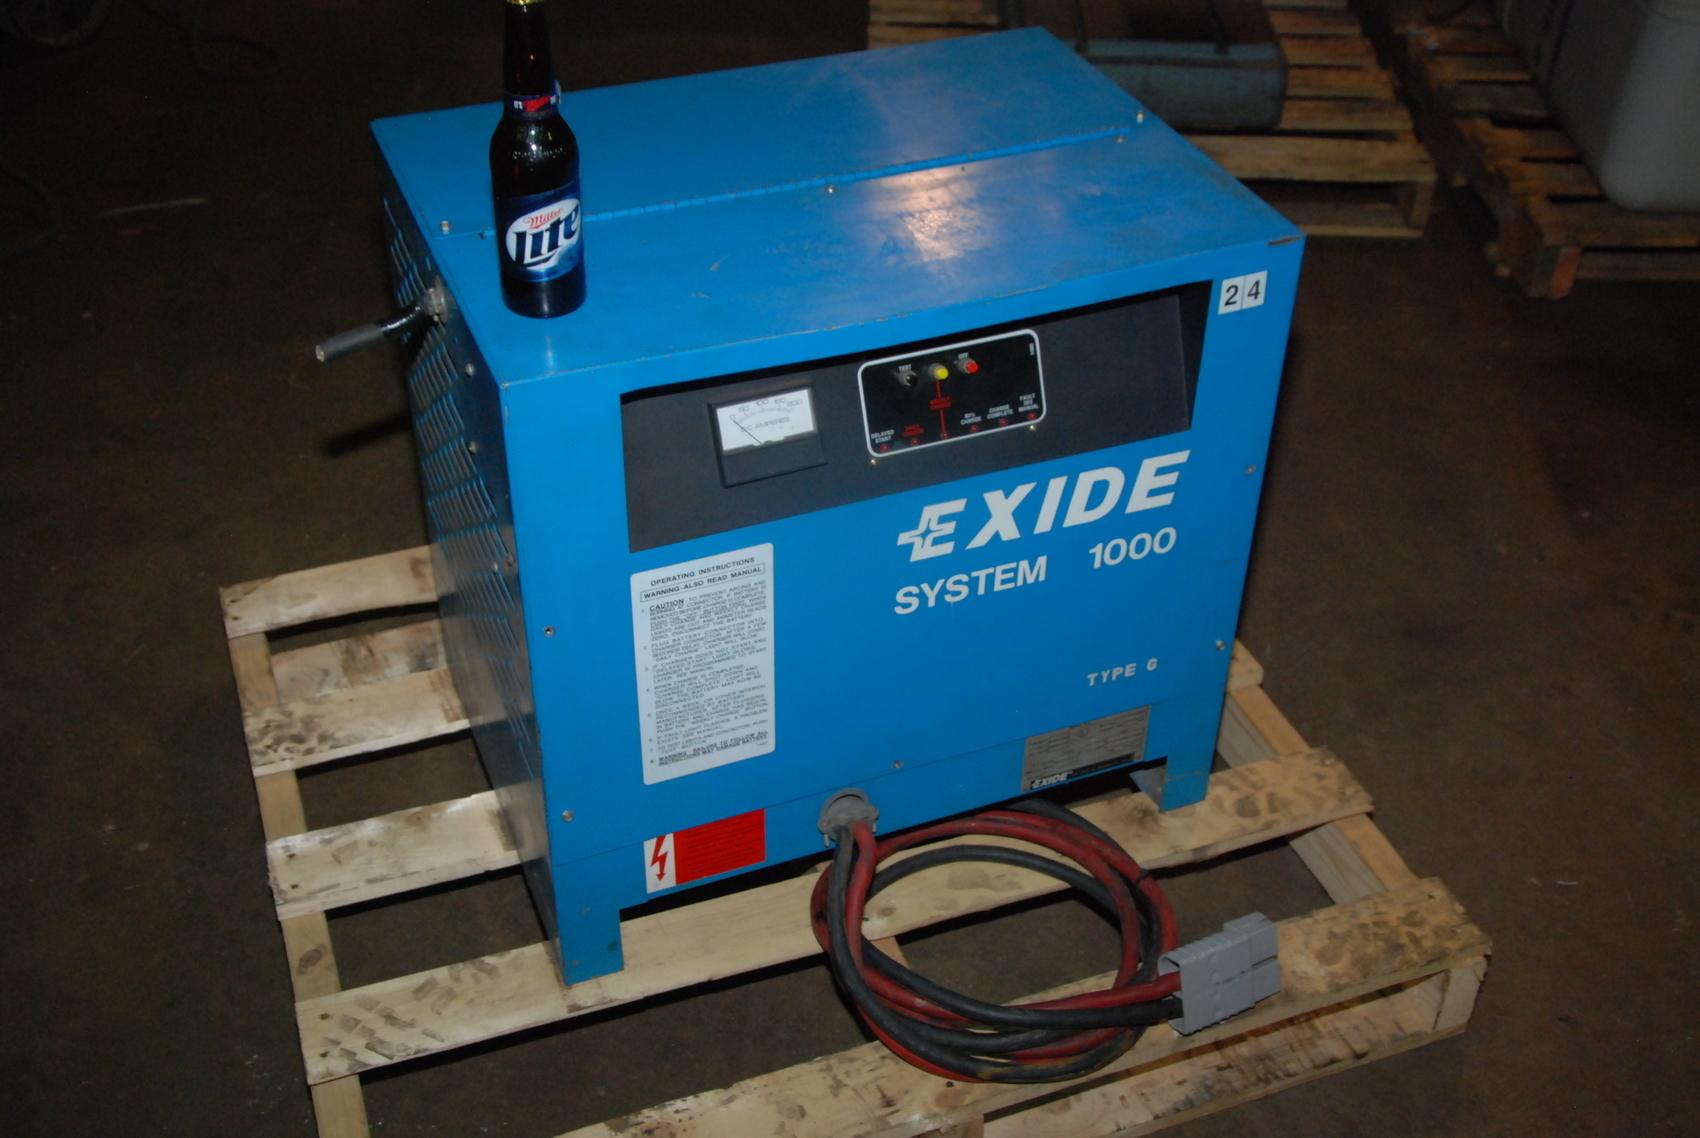 Exide G1-12-775B forklift Battery Charger;24VDC output;143 Amps max